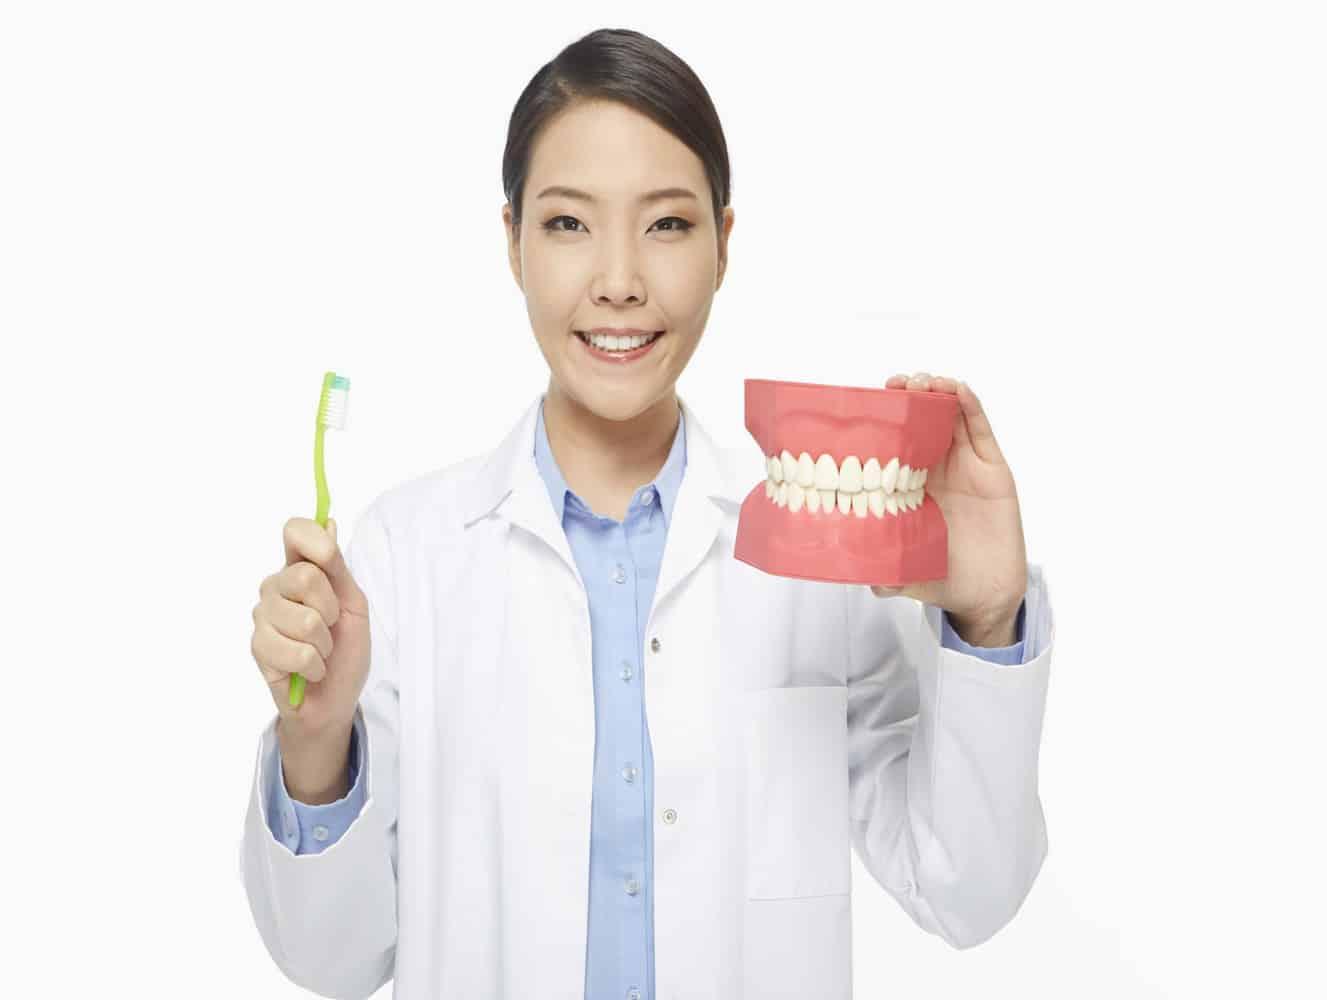 Soins dentaires remboursement